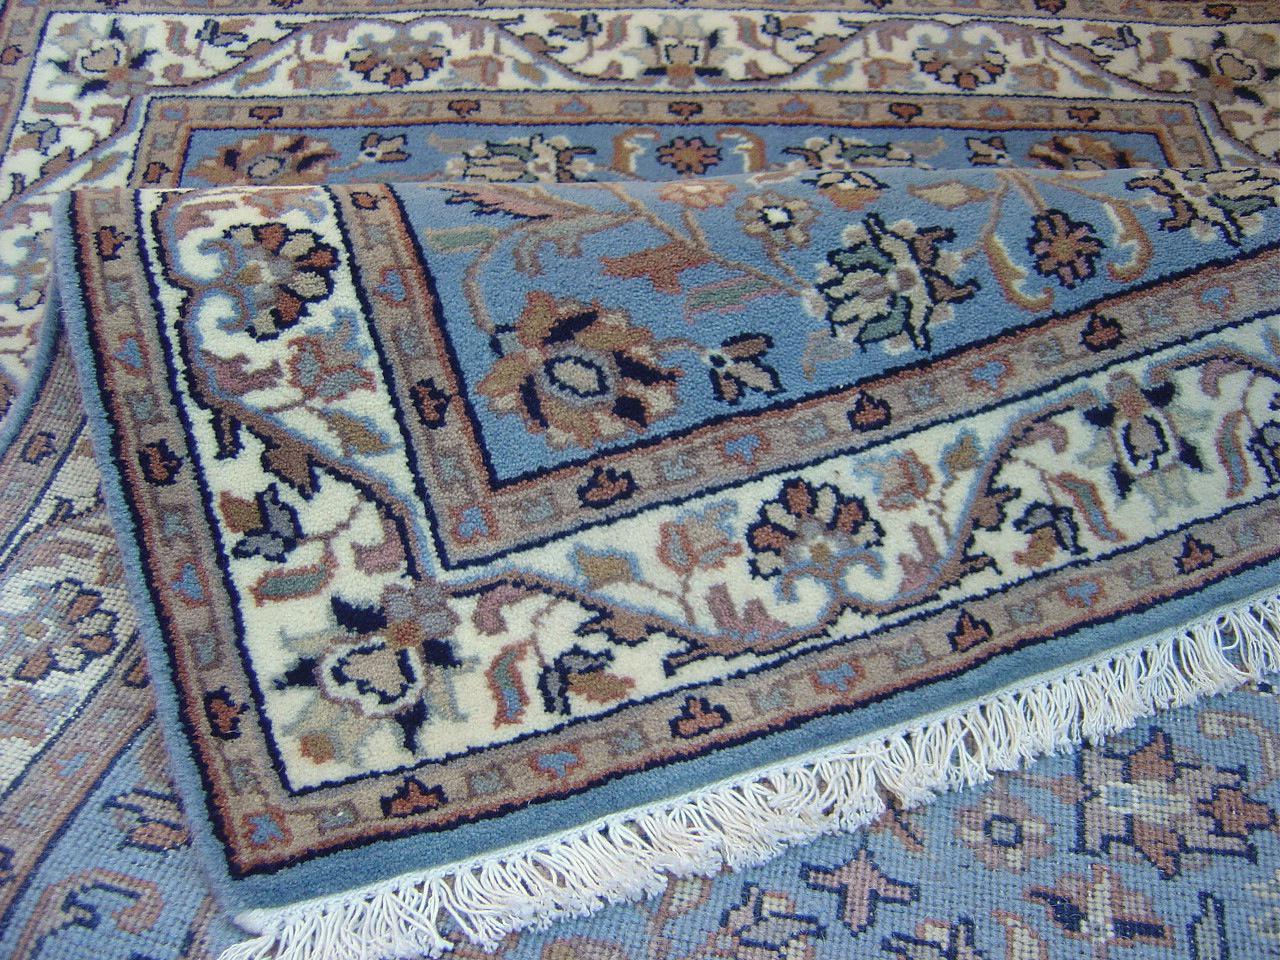 Extrêmement Isfahan Indi Tapis classiques - N°306 - 160x90cm NG14